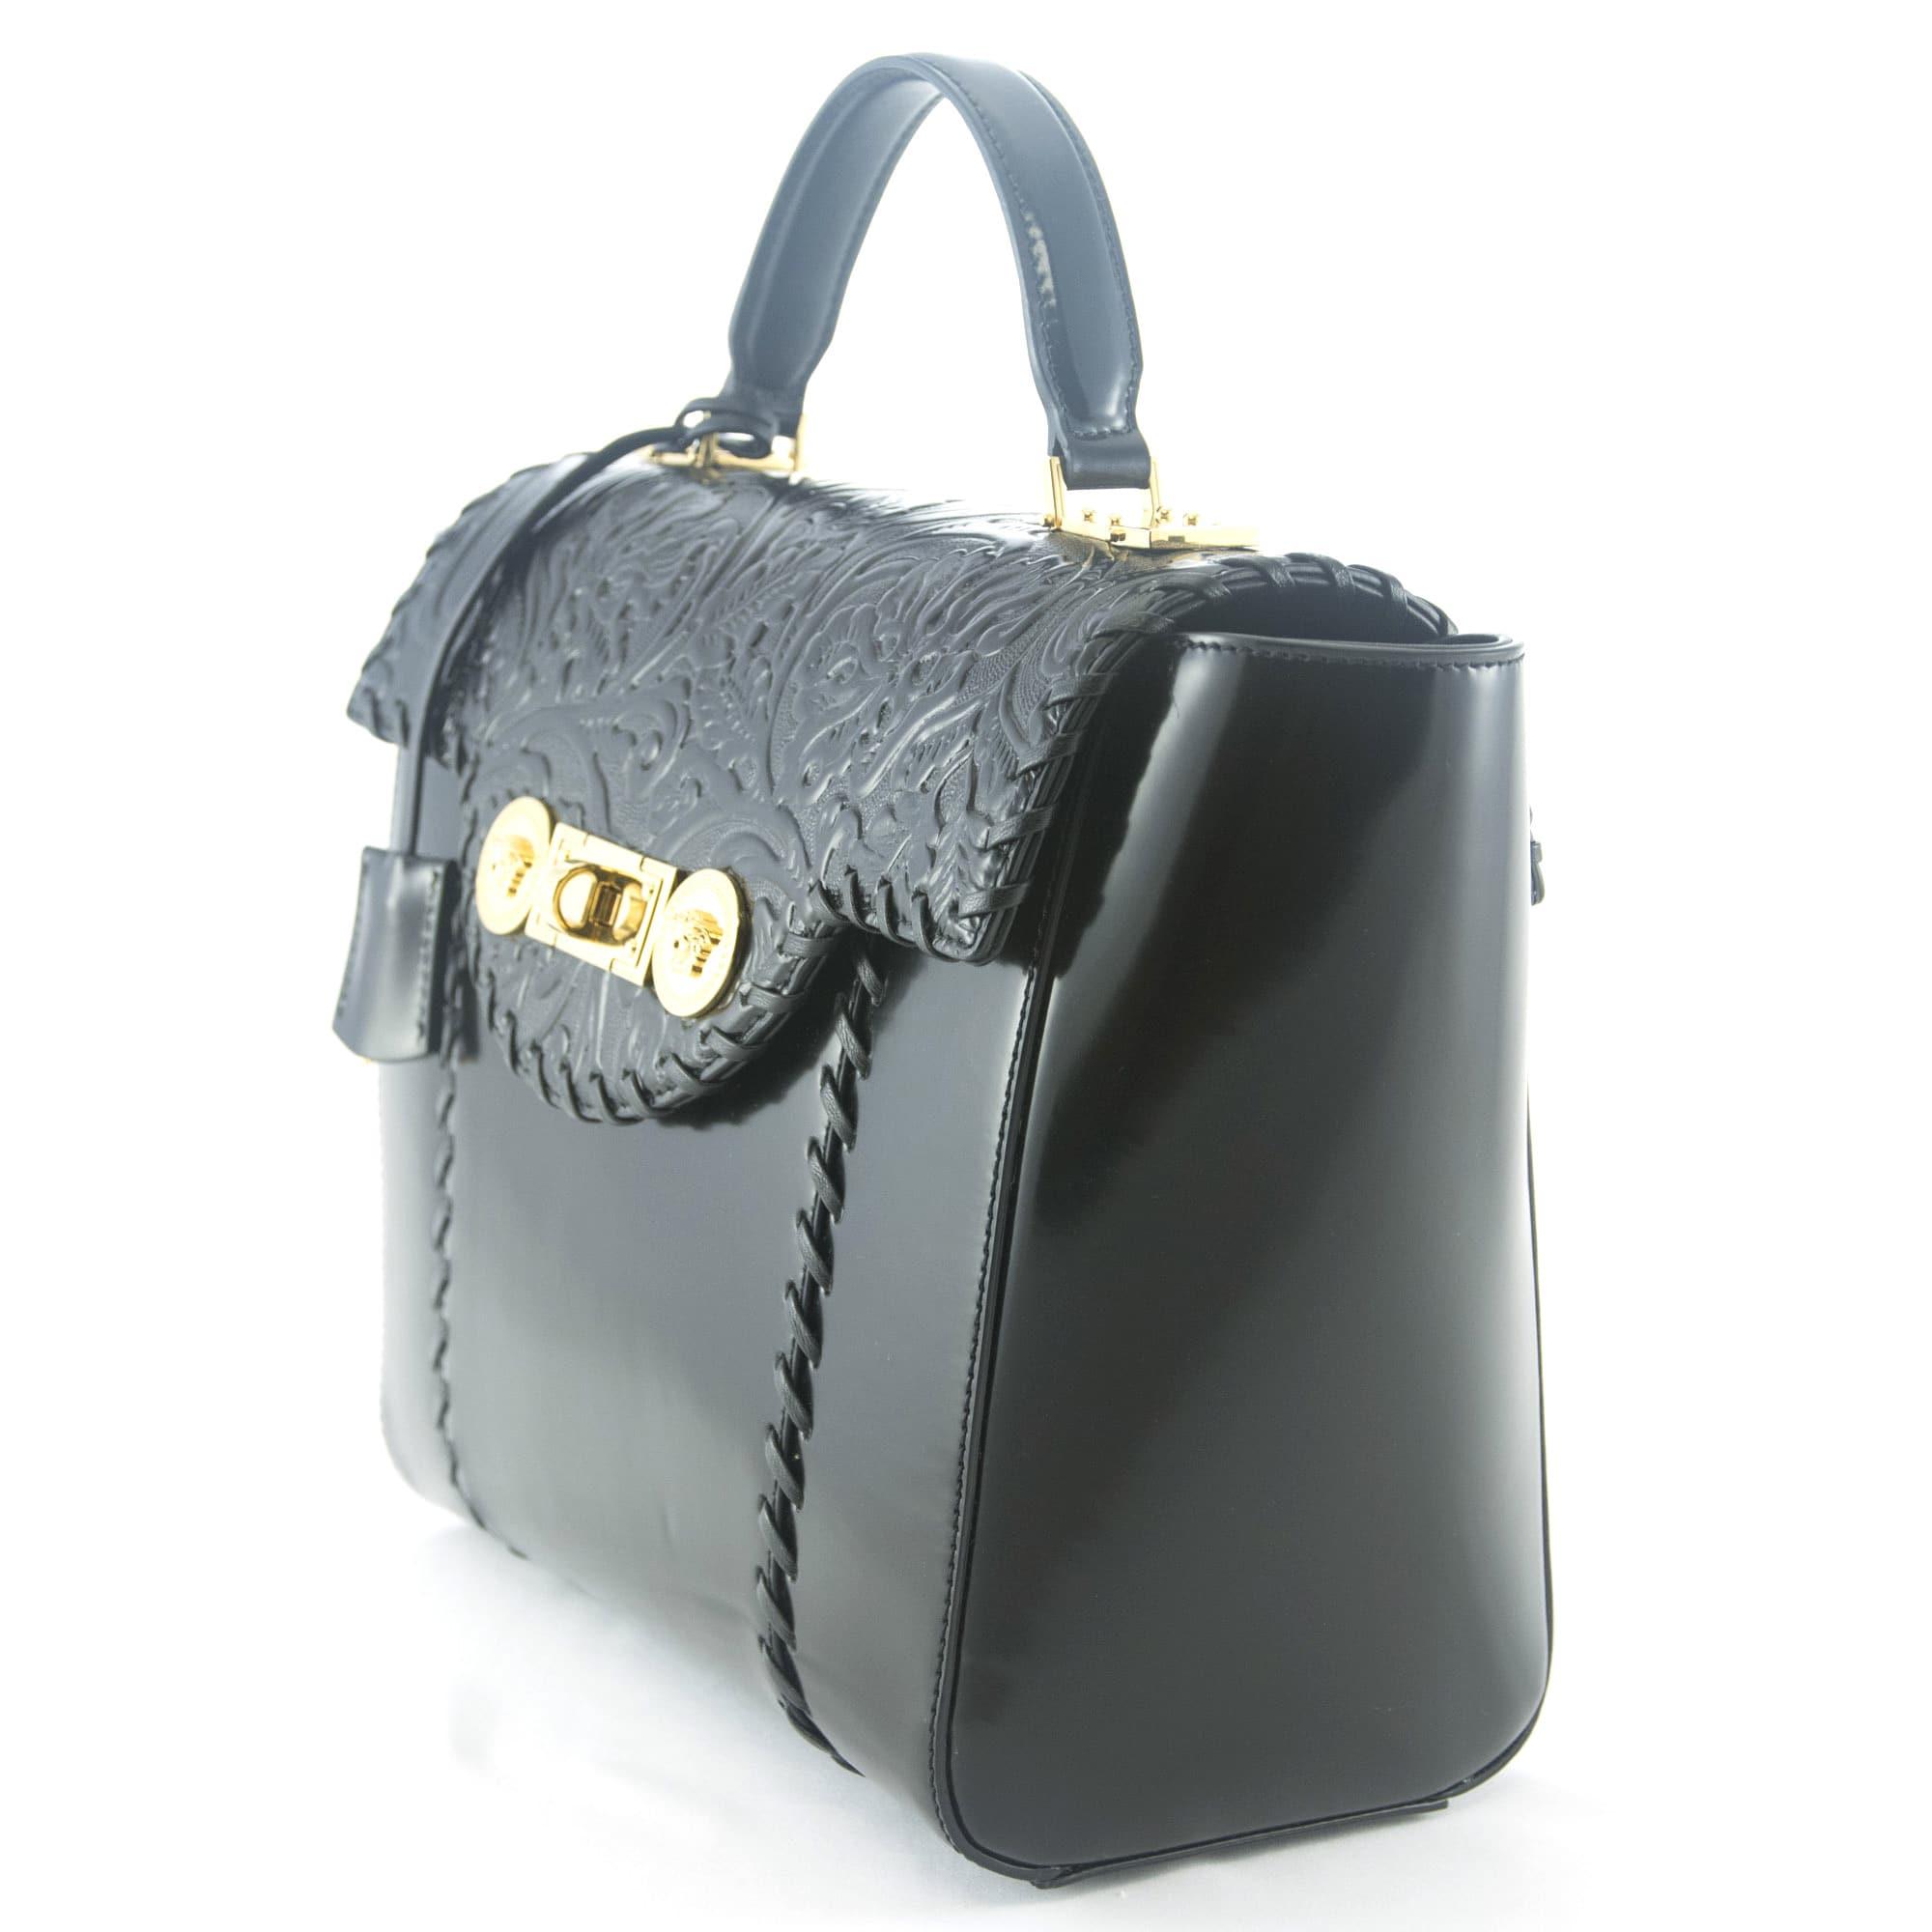 5c2325132918 ... Shop Versace Signature Lock Leather Handbag - Free Shipping Today -  Overstock.com - 11717086 ...